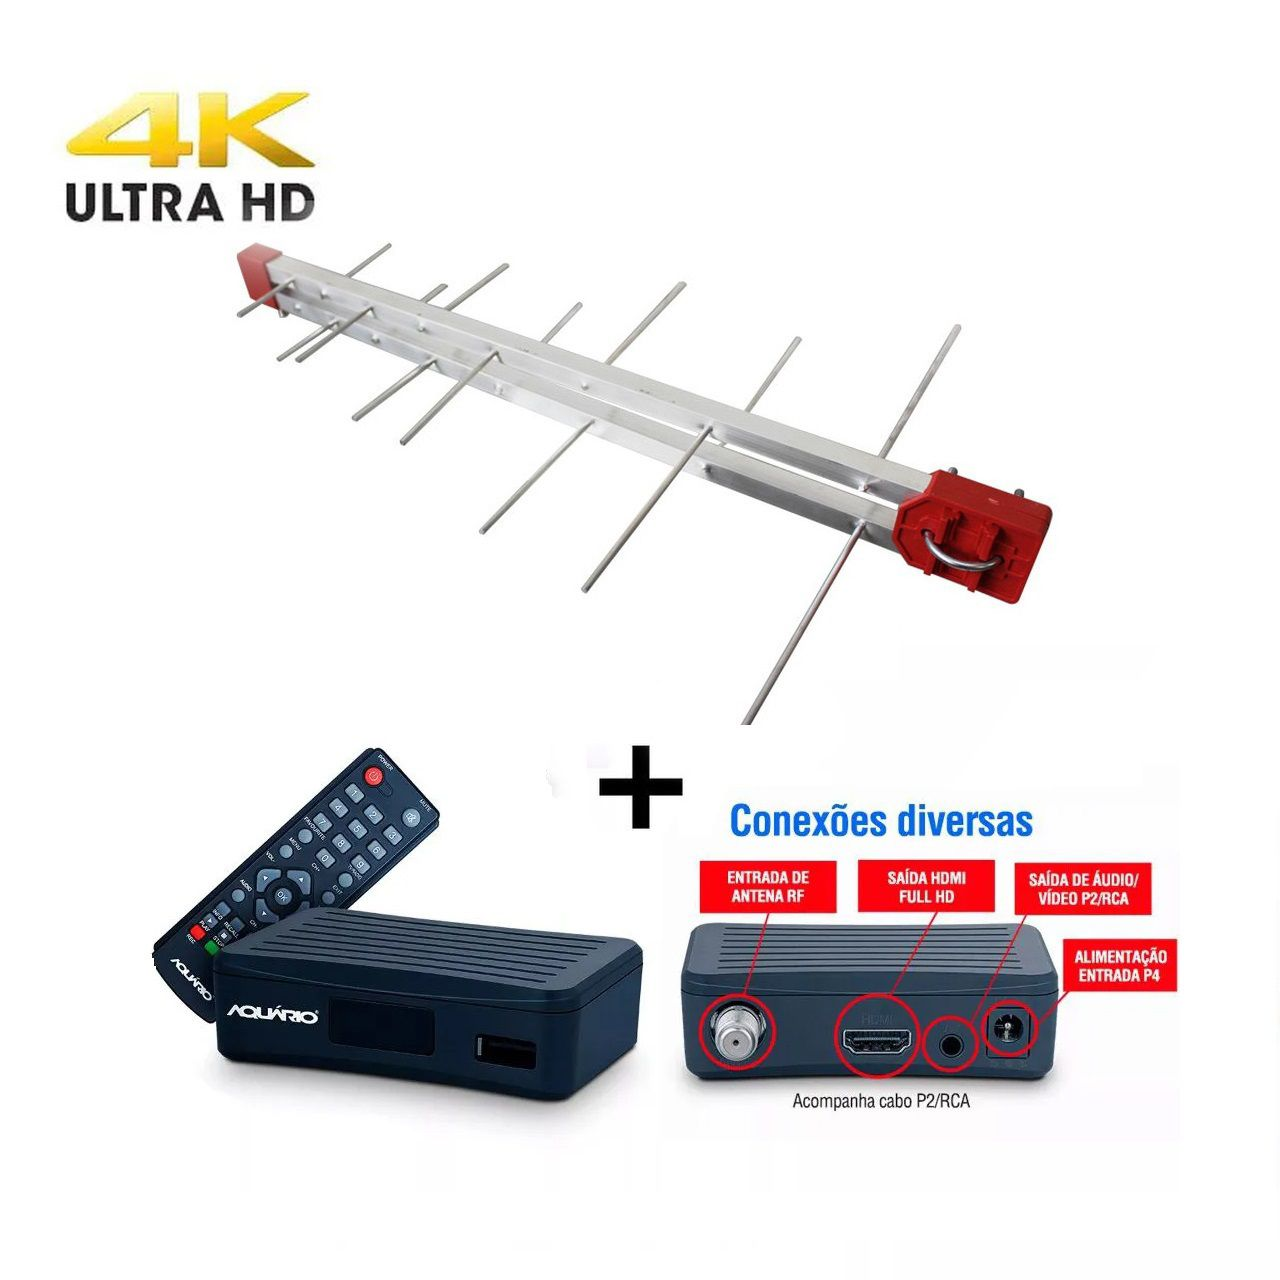 Kit Antena Digital 4K Log 20 Conversor DTV4000, 12mt Cabo Coaxial c/ Conector  4K